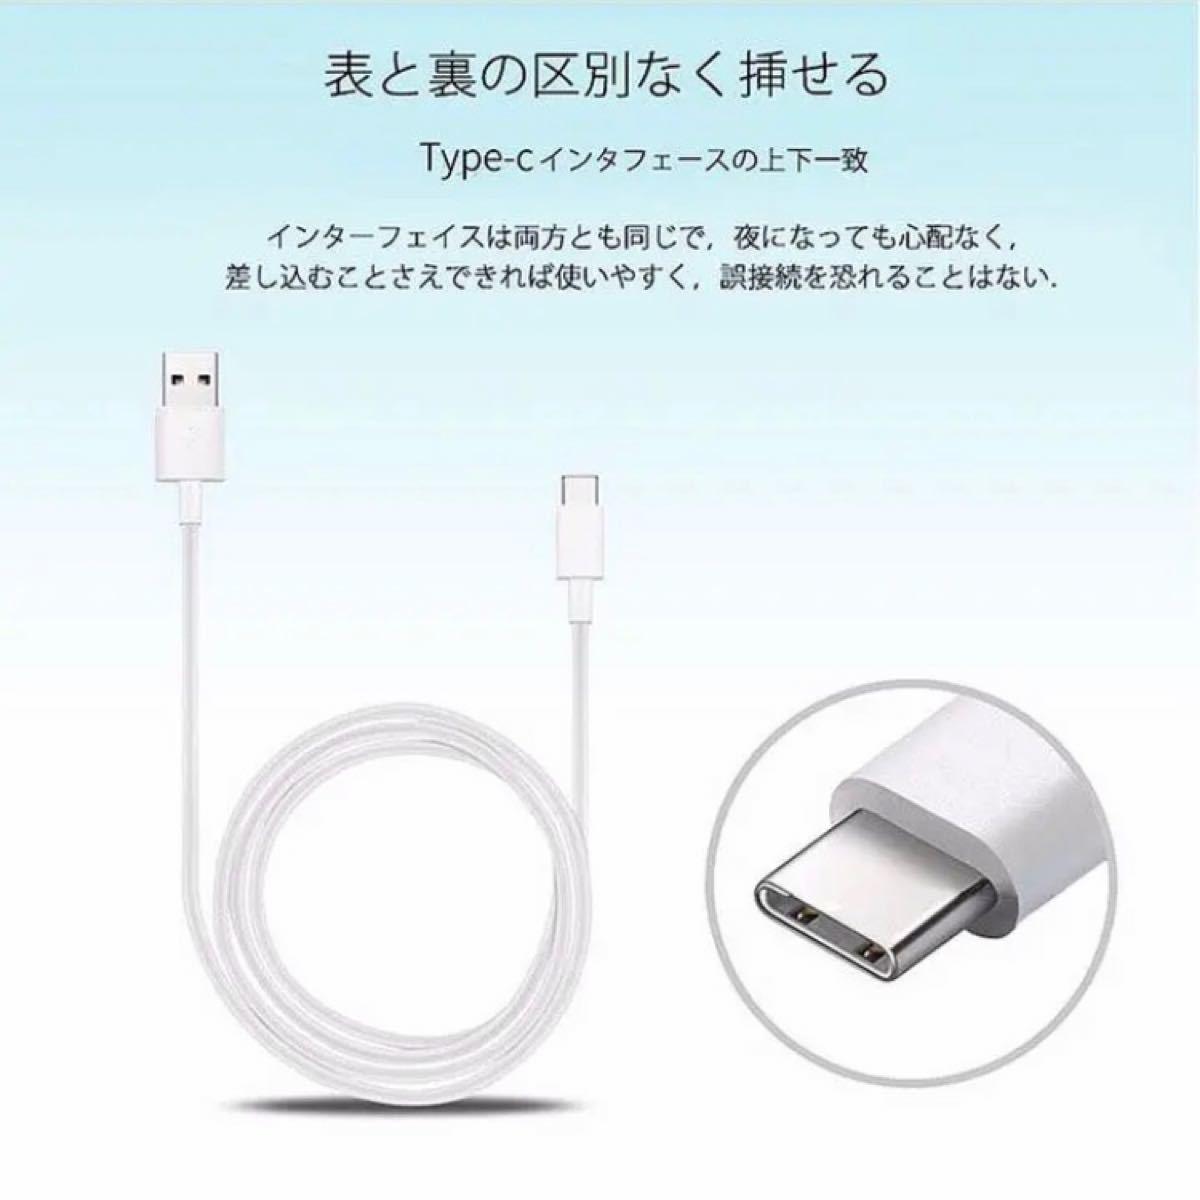 2M 正規品 USB type-c to Lightning 充電ケーブル 純正品質 PD対応